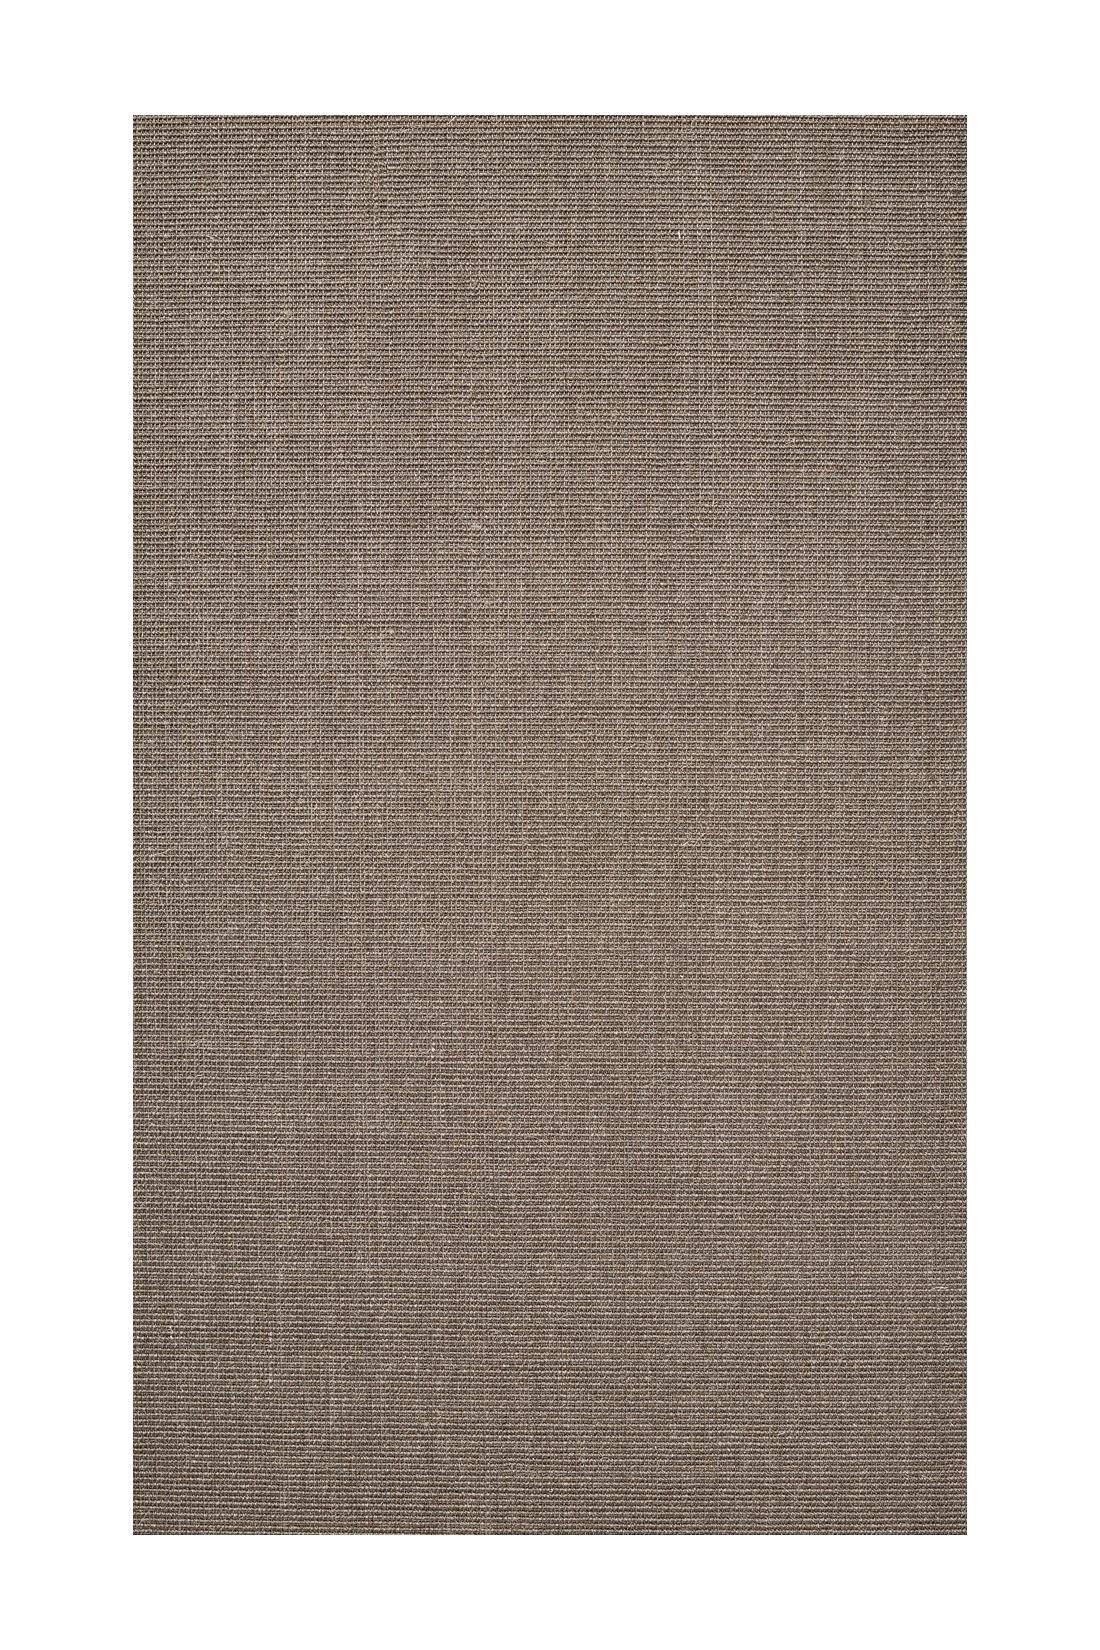 sisal rugs create a boucle sisal rug RHNRUDY